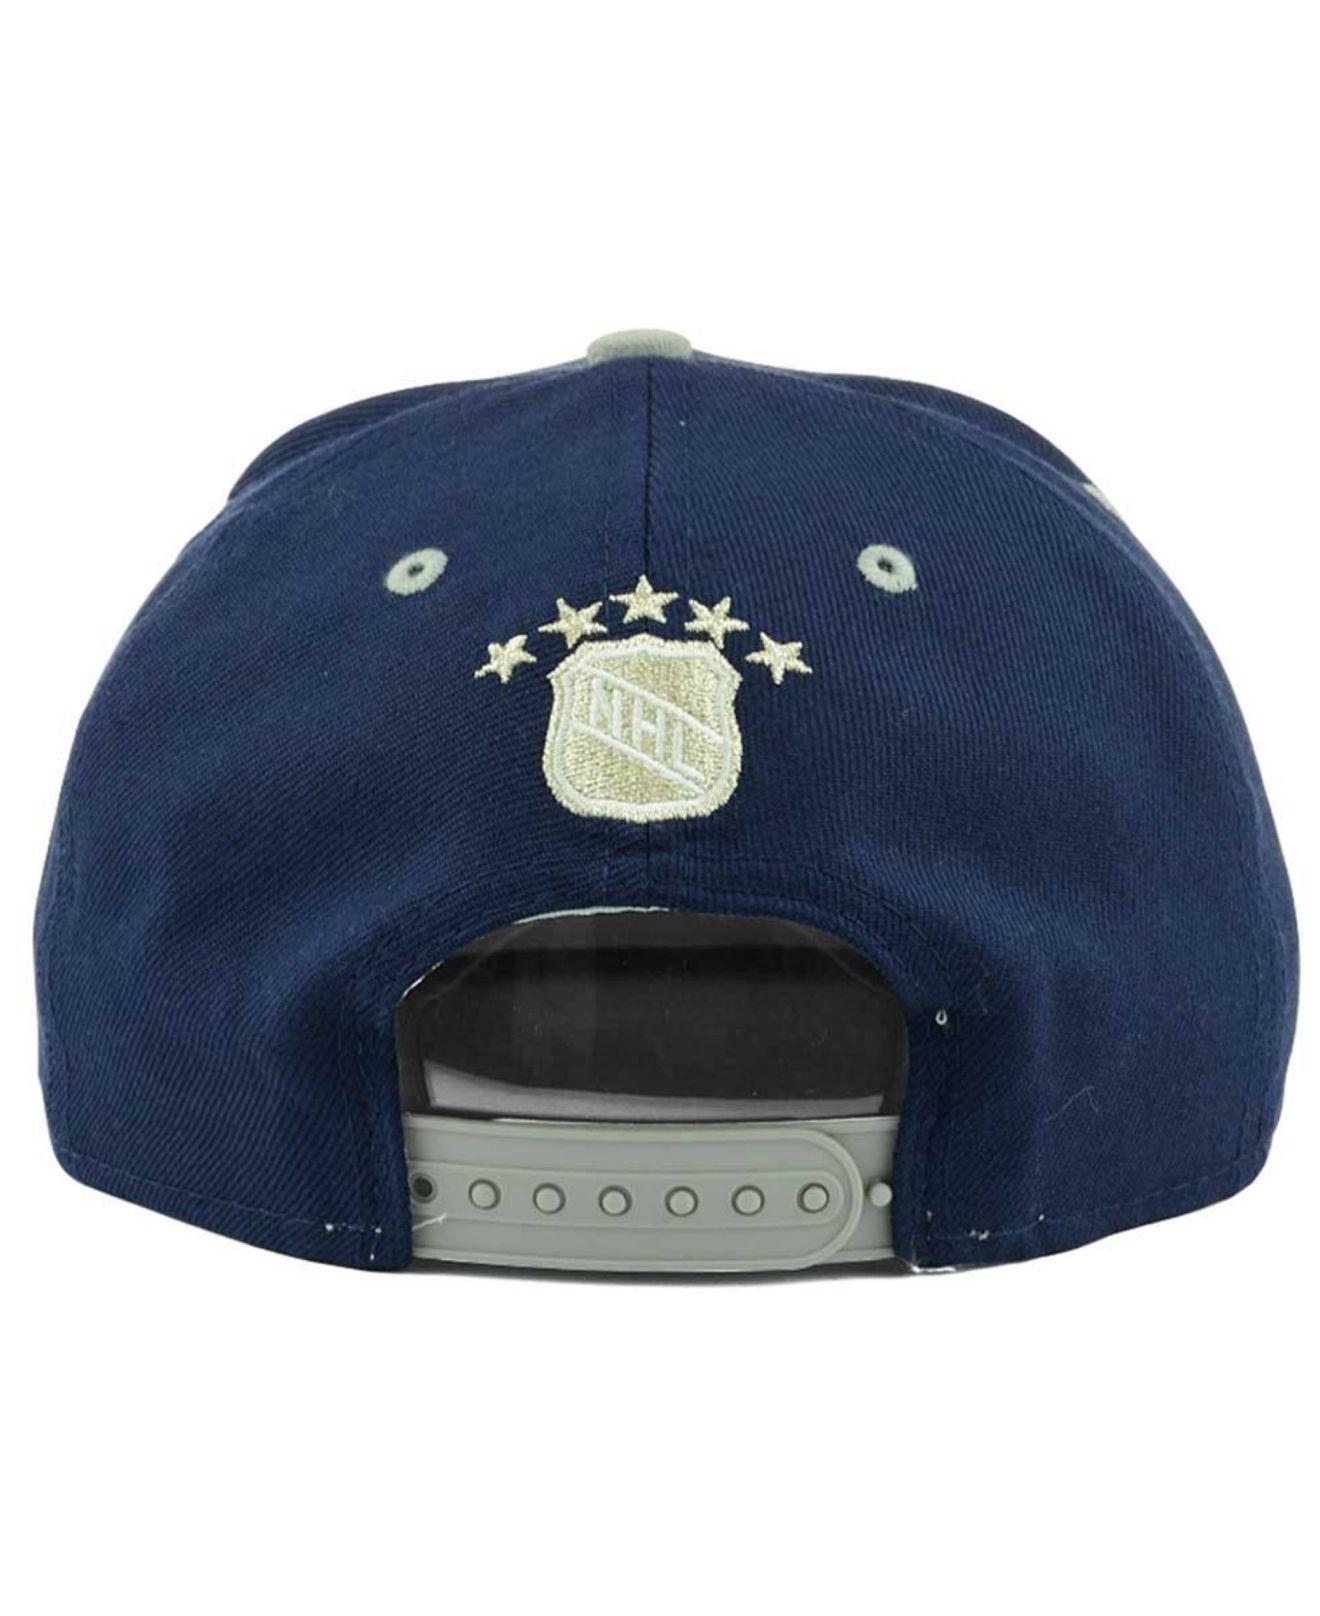 premium selection 835c8 d5963 KTZ Toronto Maple Leafs Vintage 2-tone 9fifty Snapback Cap in Blue ...